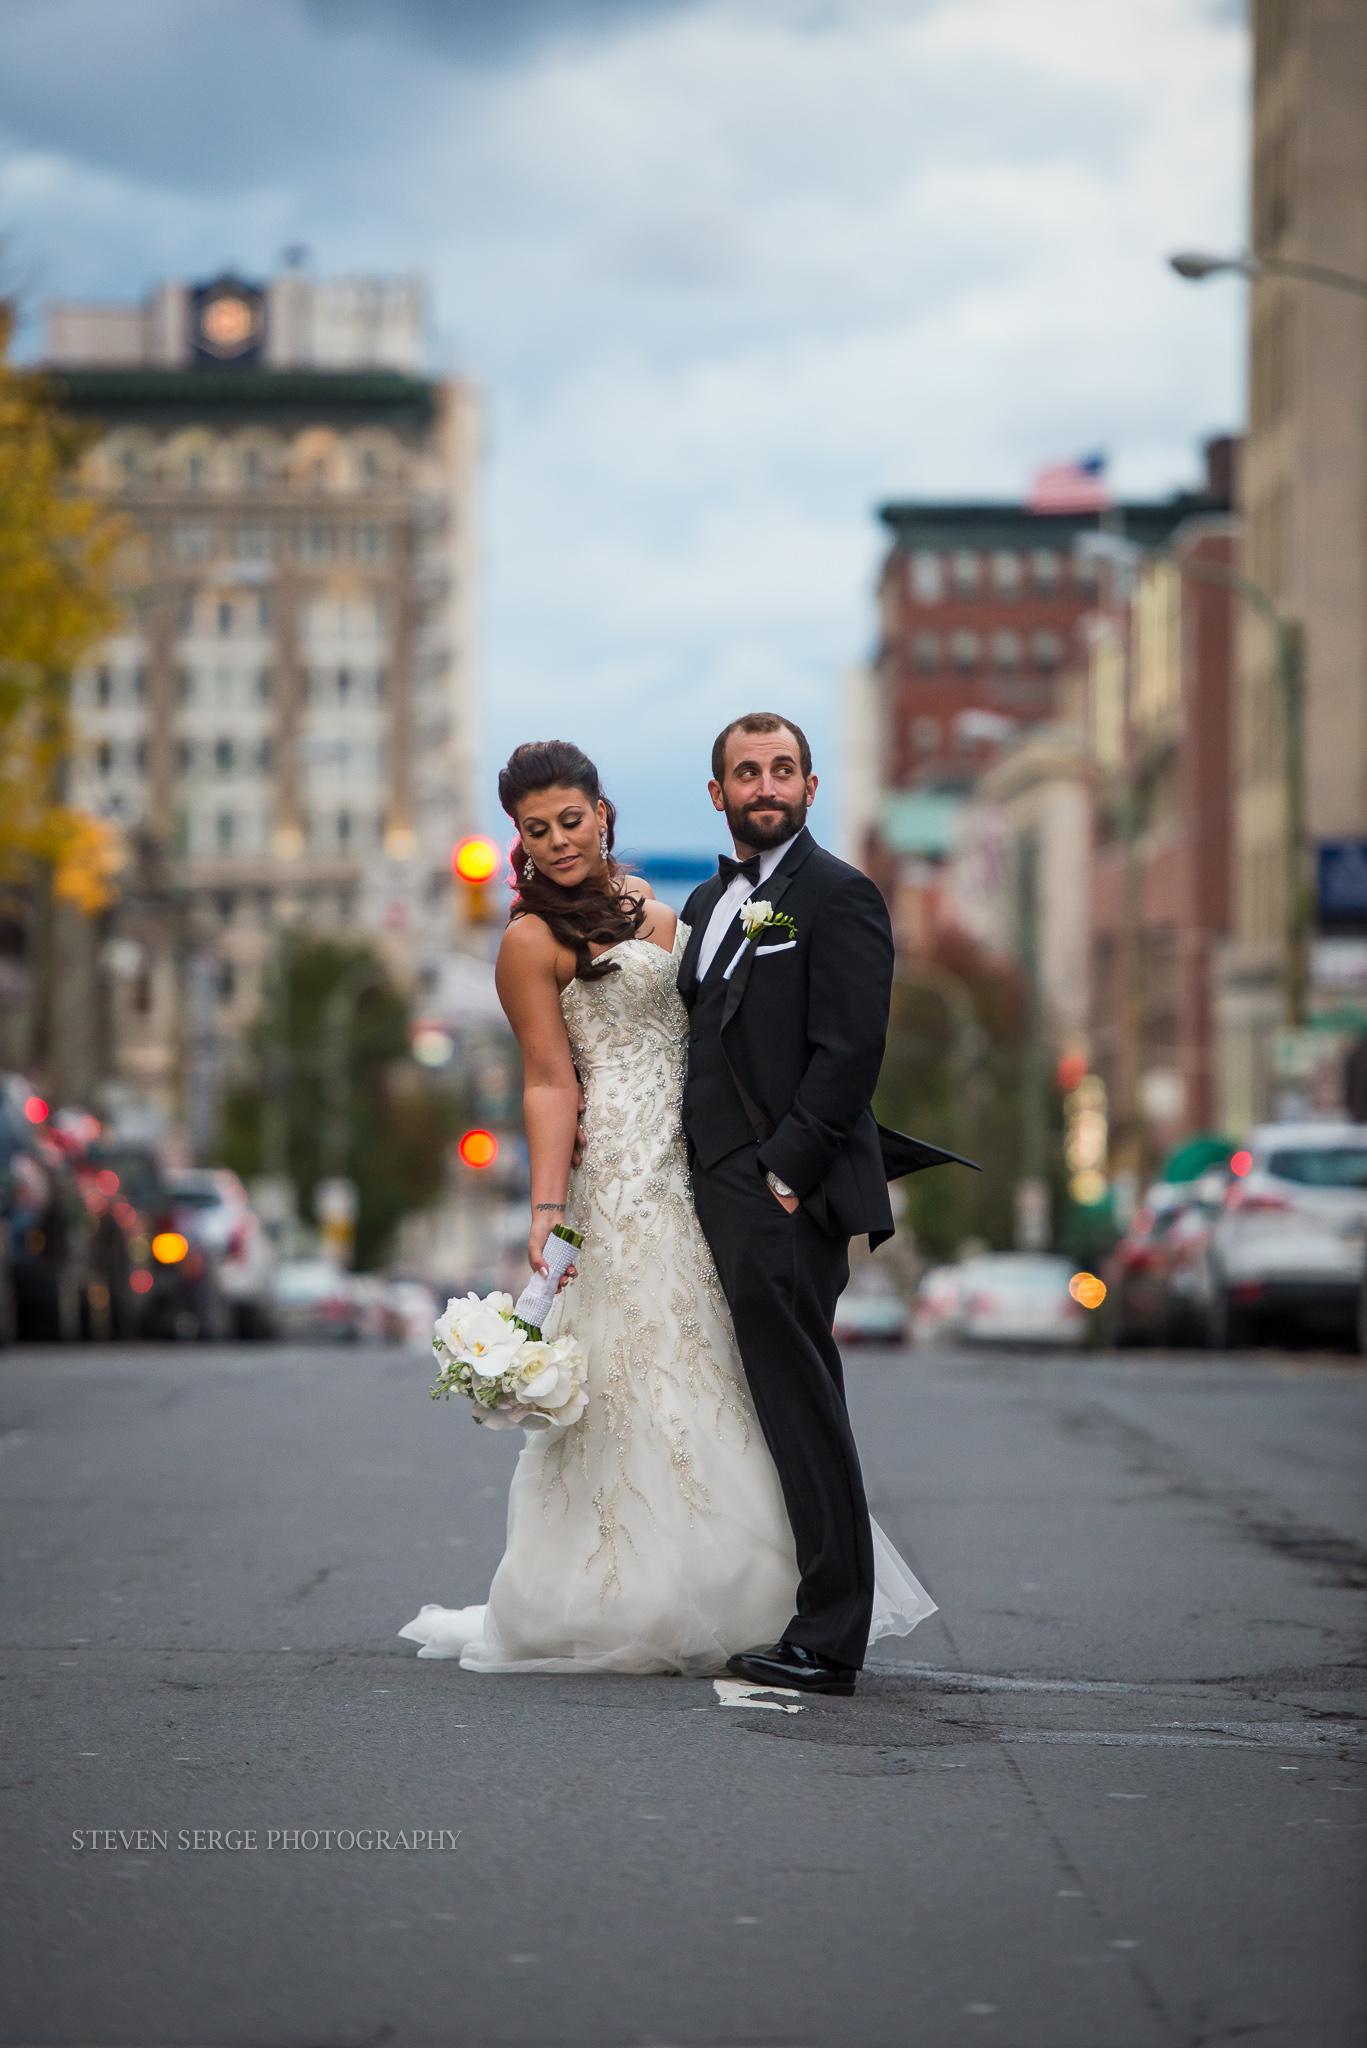 Denn-NEPA-Scranton-wedding-photographer-cultural-downtown-street-photography-dress-3.jpg